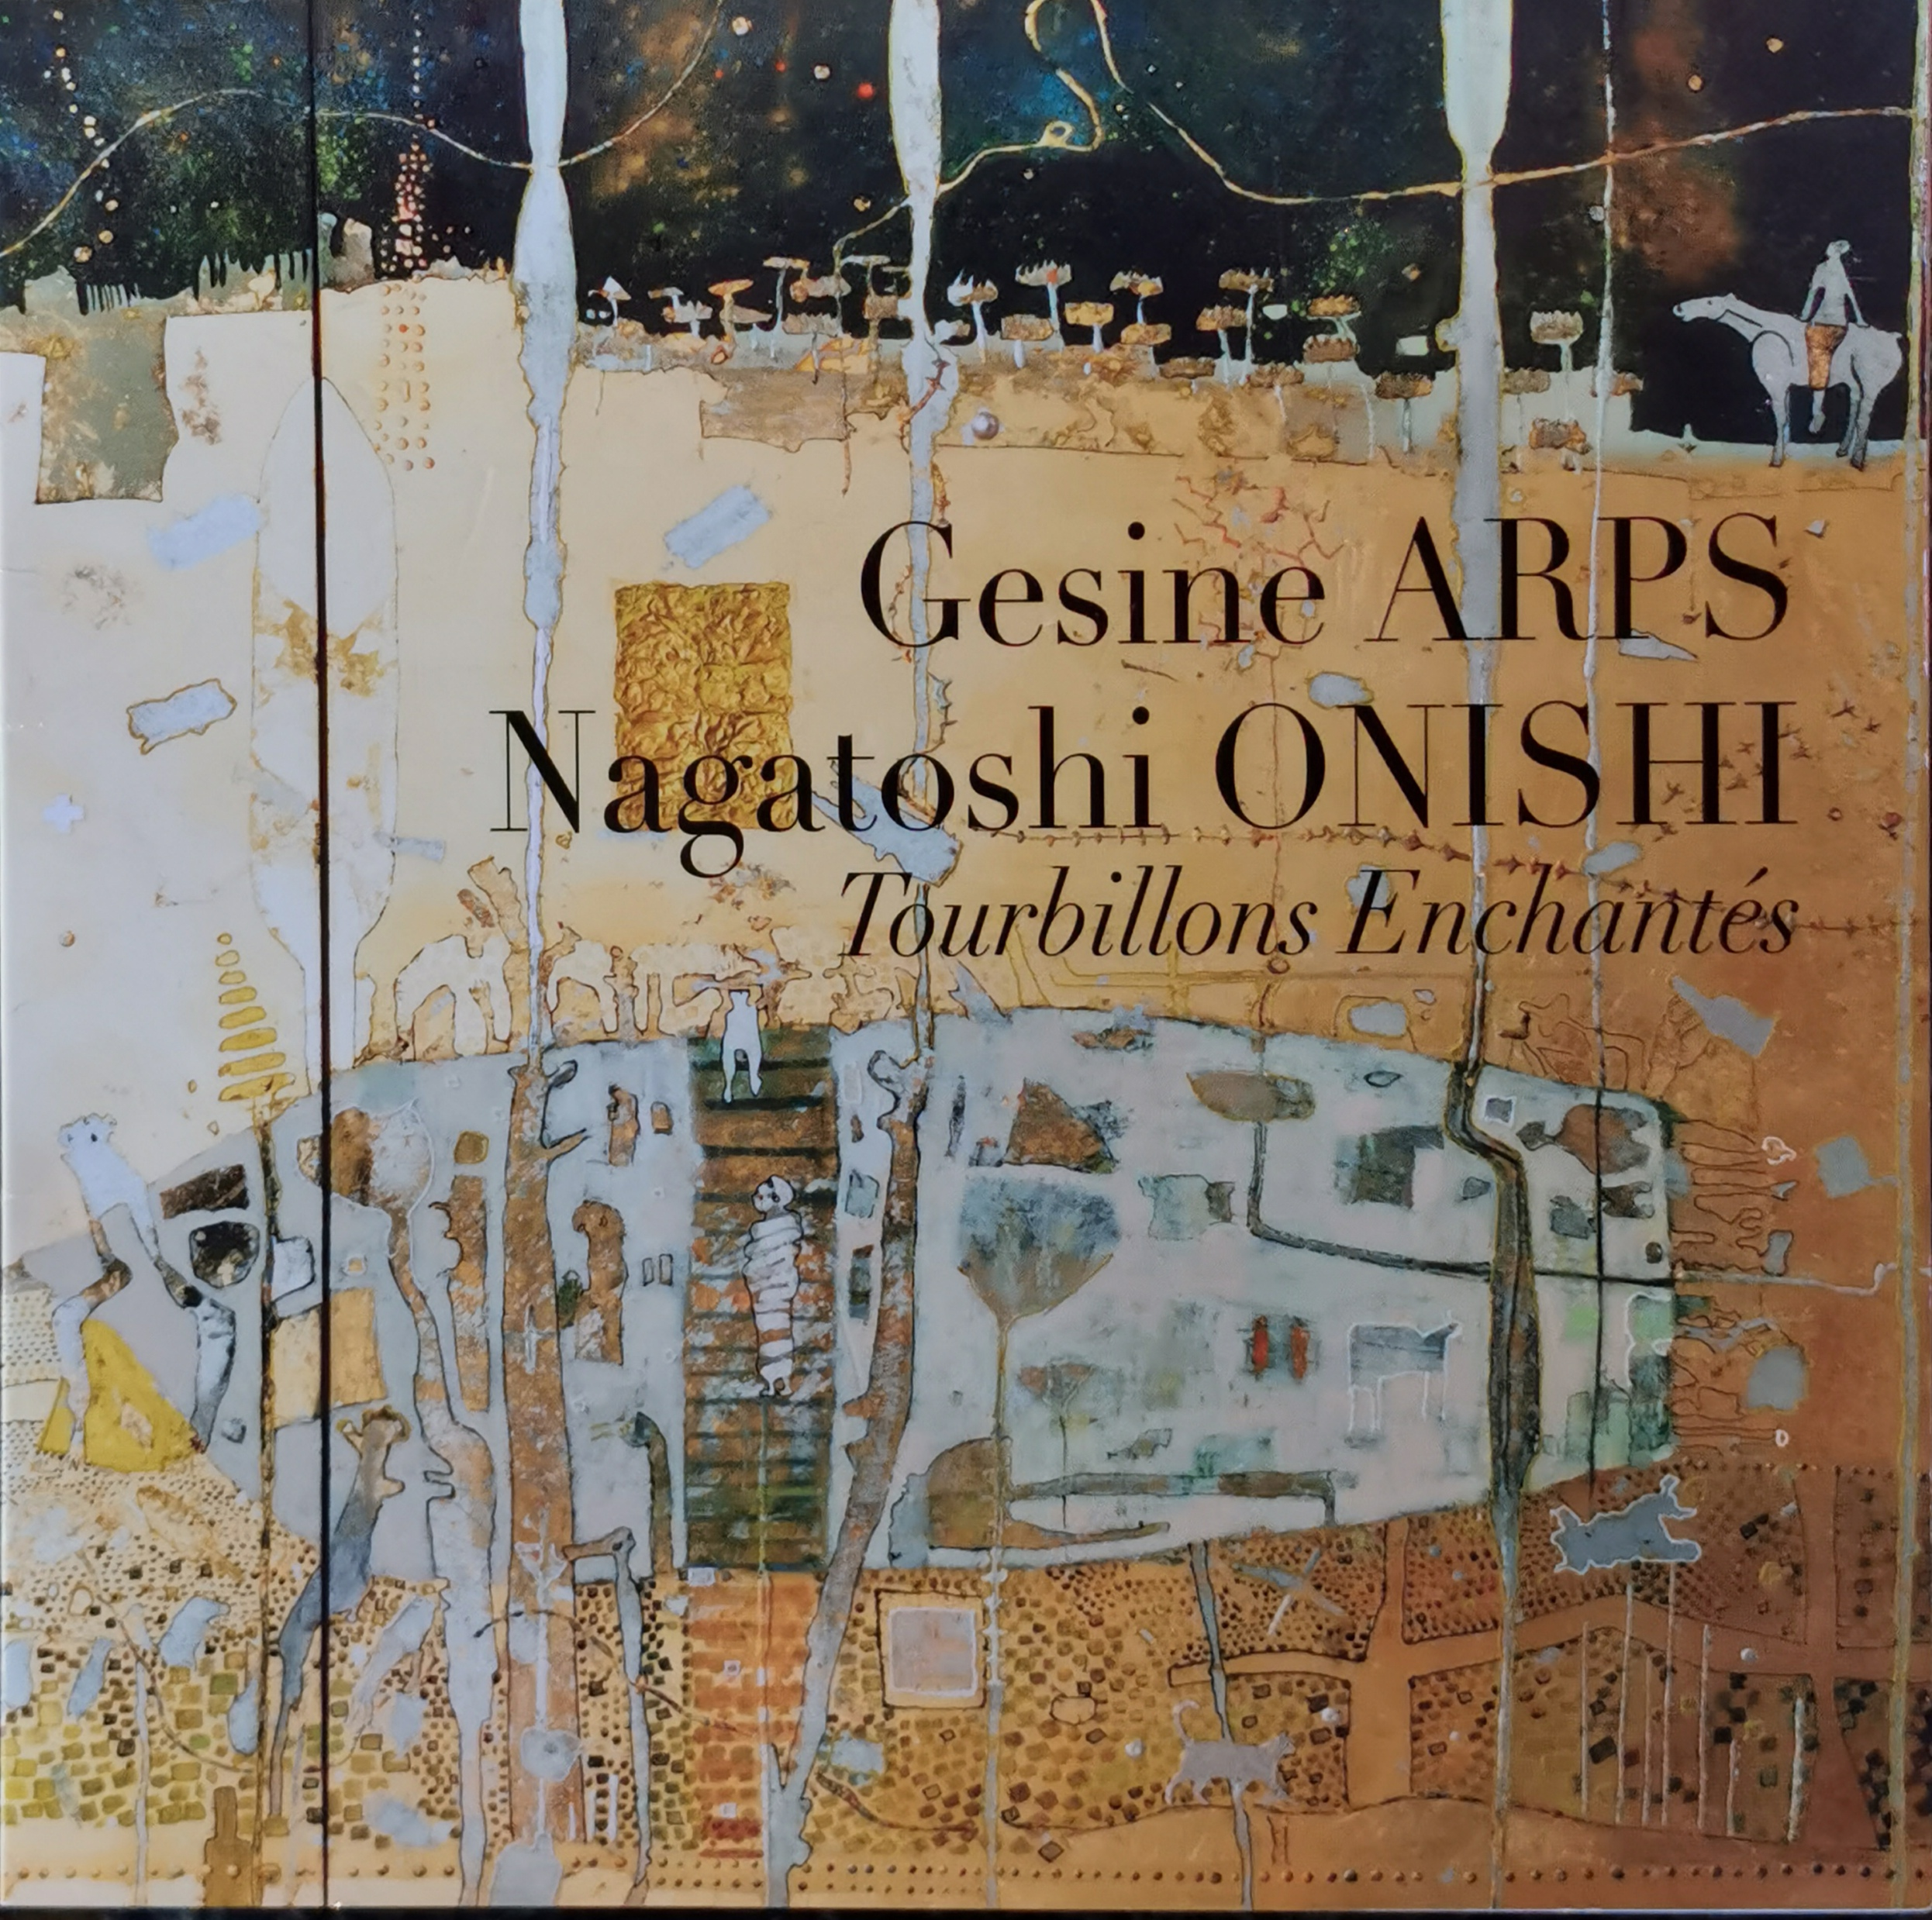 Gesine Arps, Nagatoshi Onishi, Tourbillons Enchantés